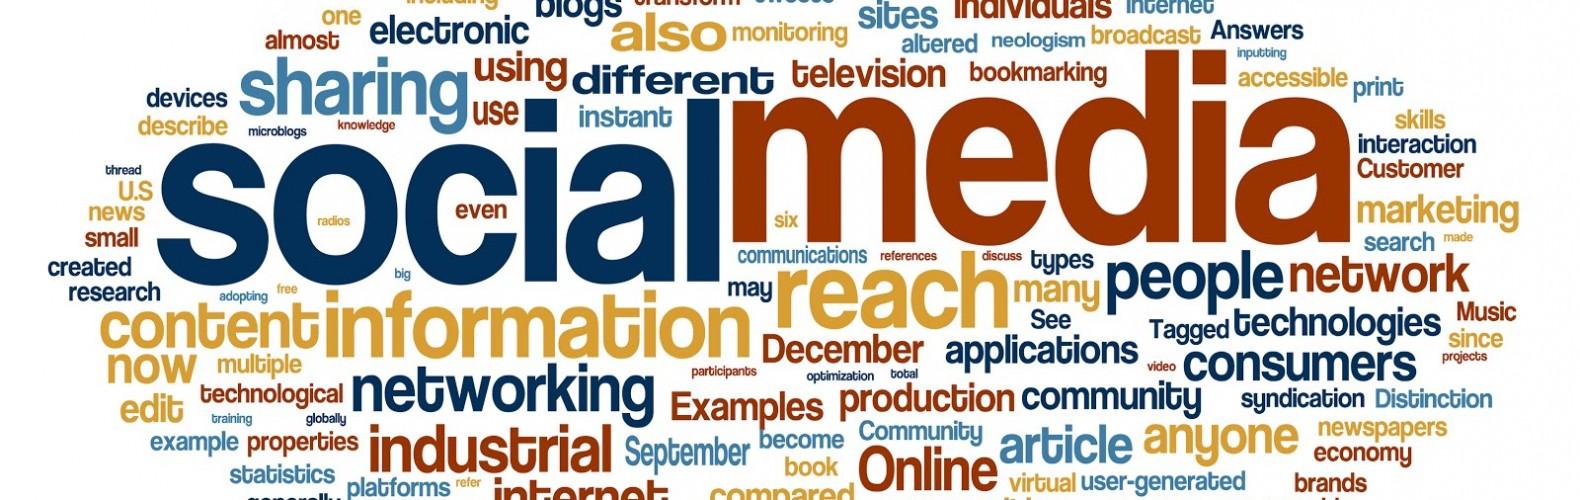 Social-media-for-public-relations1 (1)